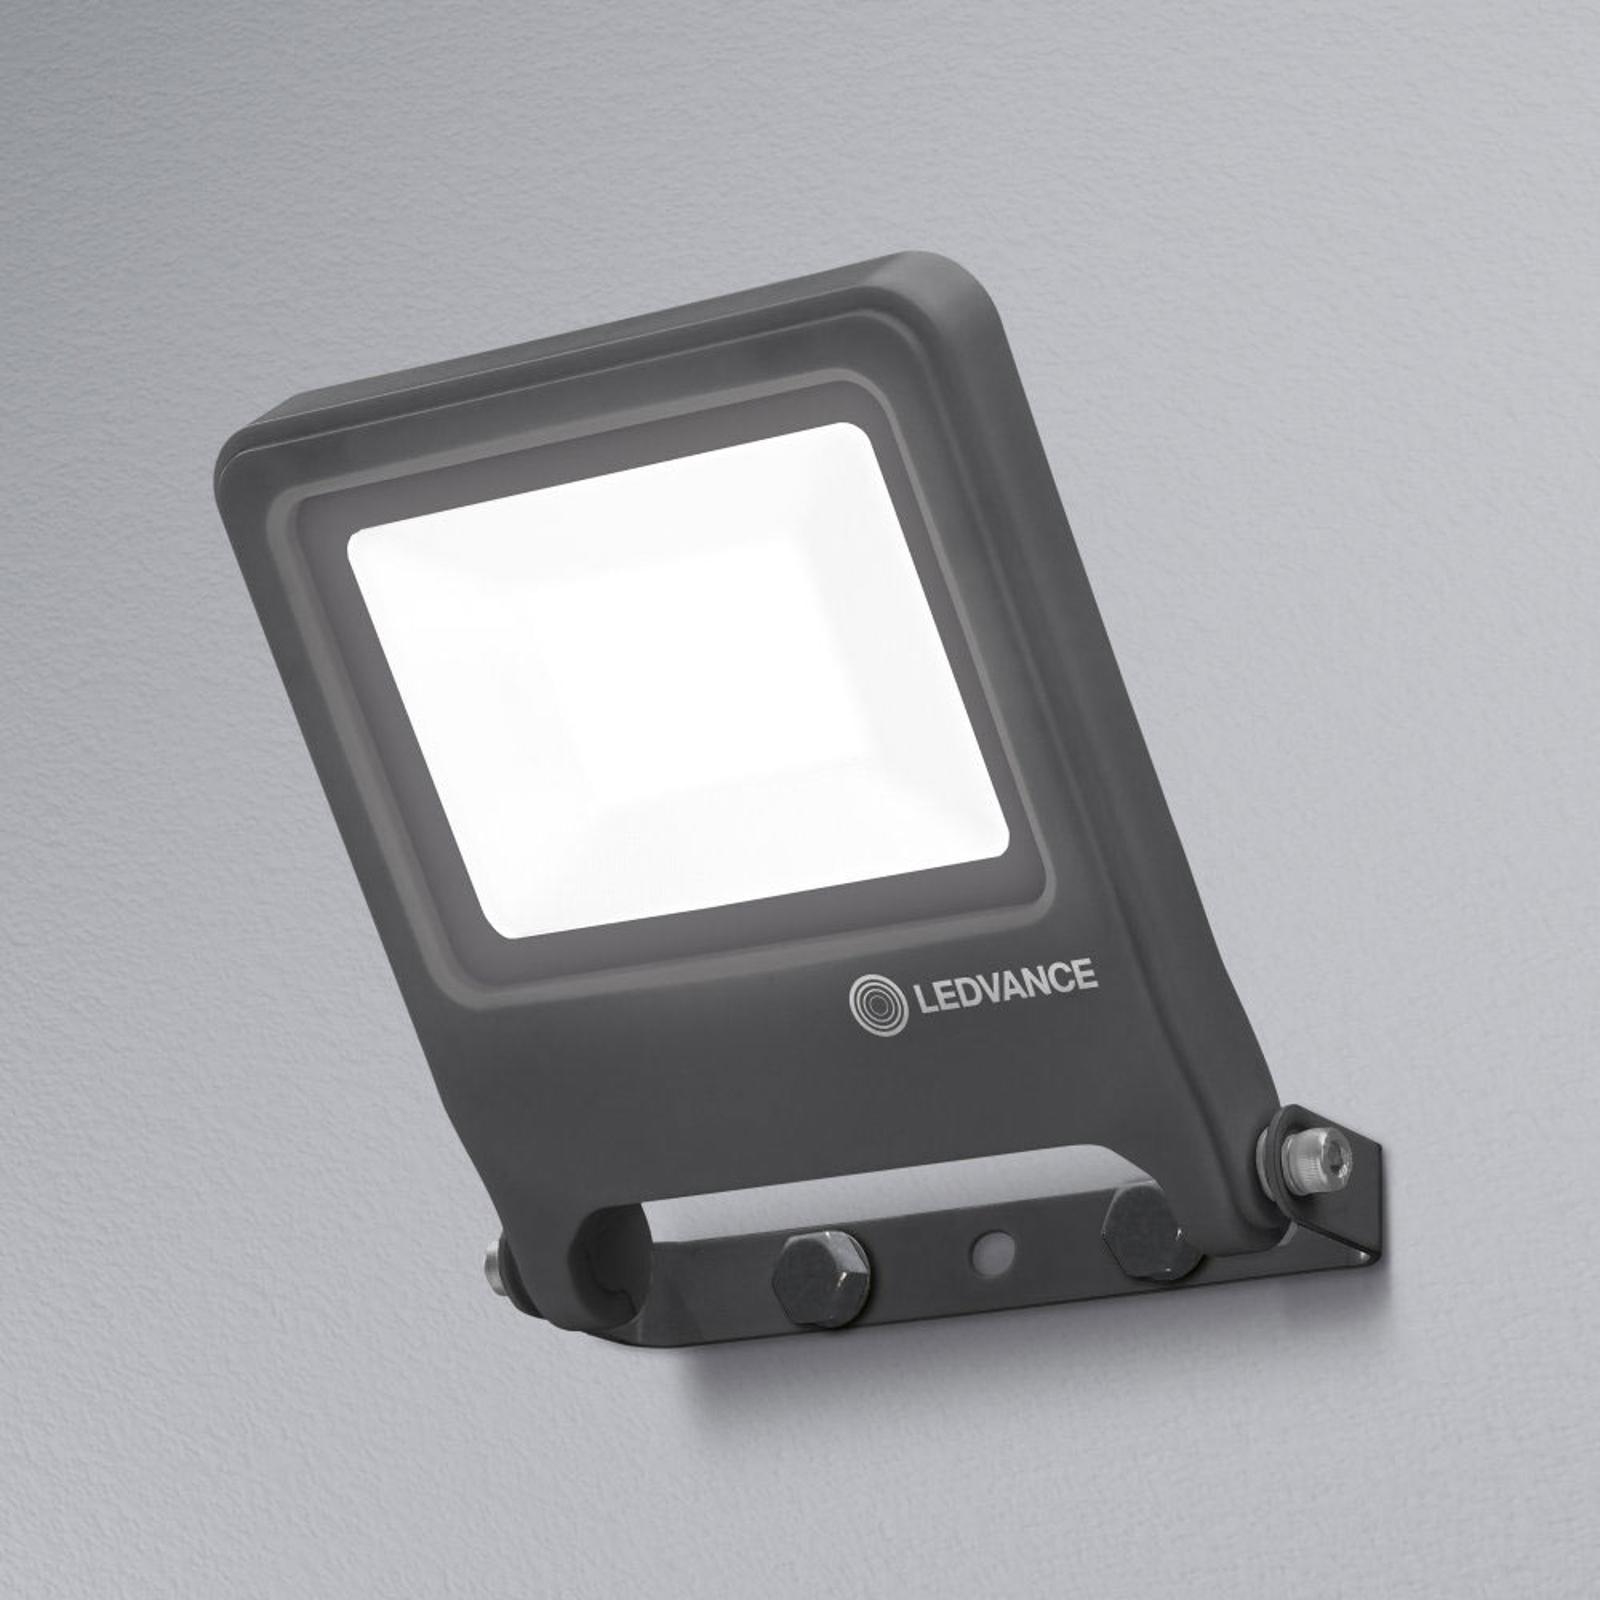 LEDVANCE Endura Floodlight LED buitenspot, 20 W